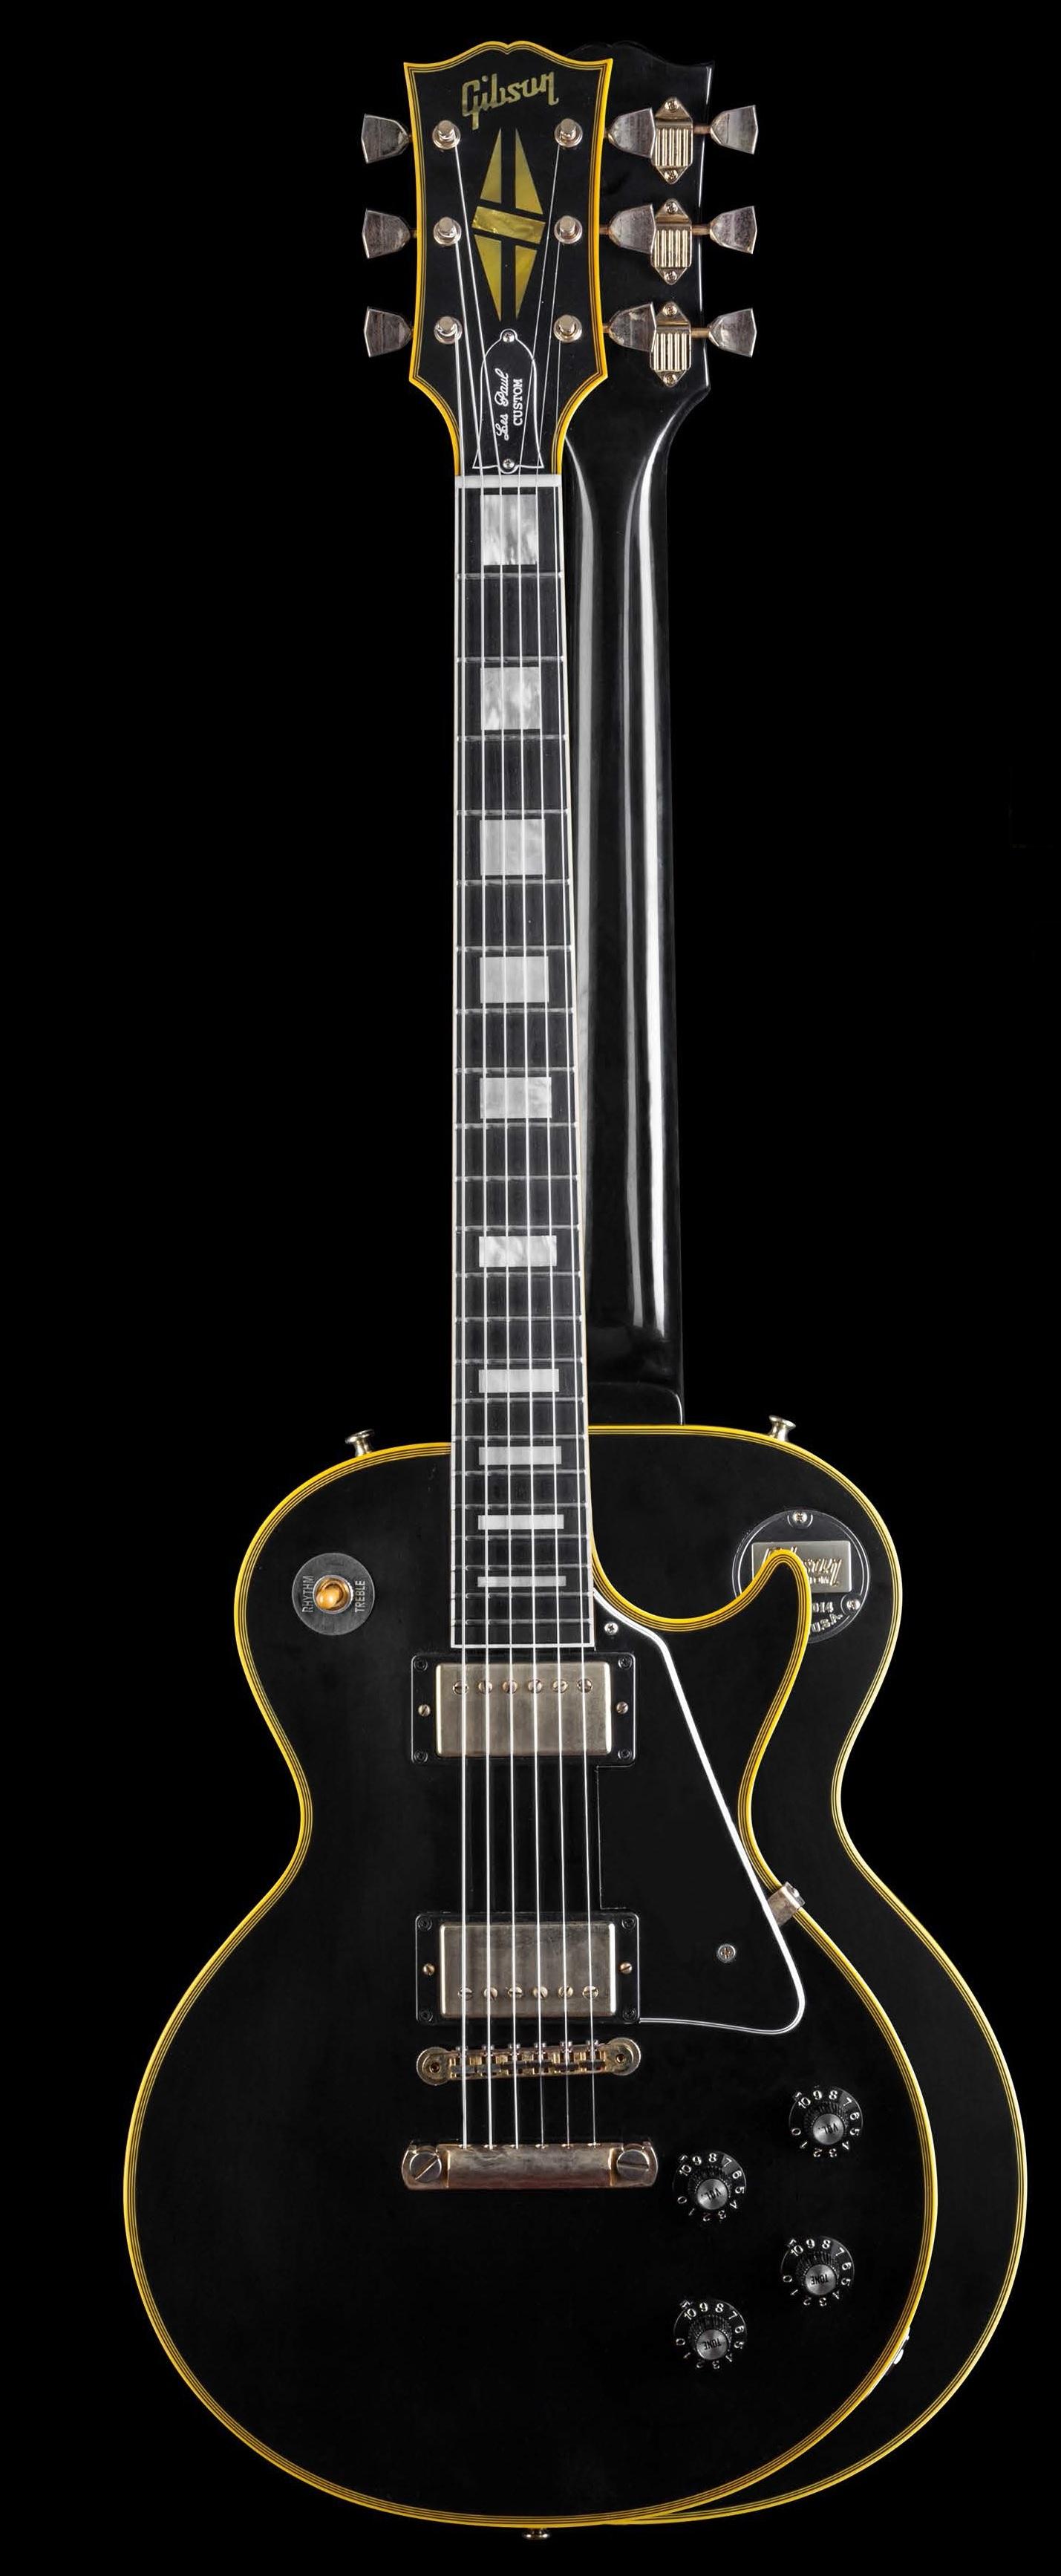 Custom 1974 Les Paul Wiring Diagram Trusted Diagrams Lp Guitar 1968 Gibson Residential Electrical Symbols U2022 Epiphone Pickup